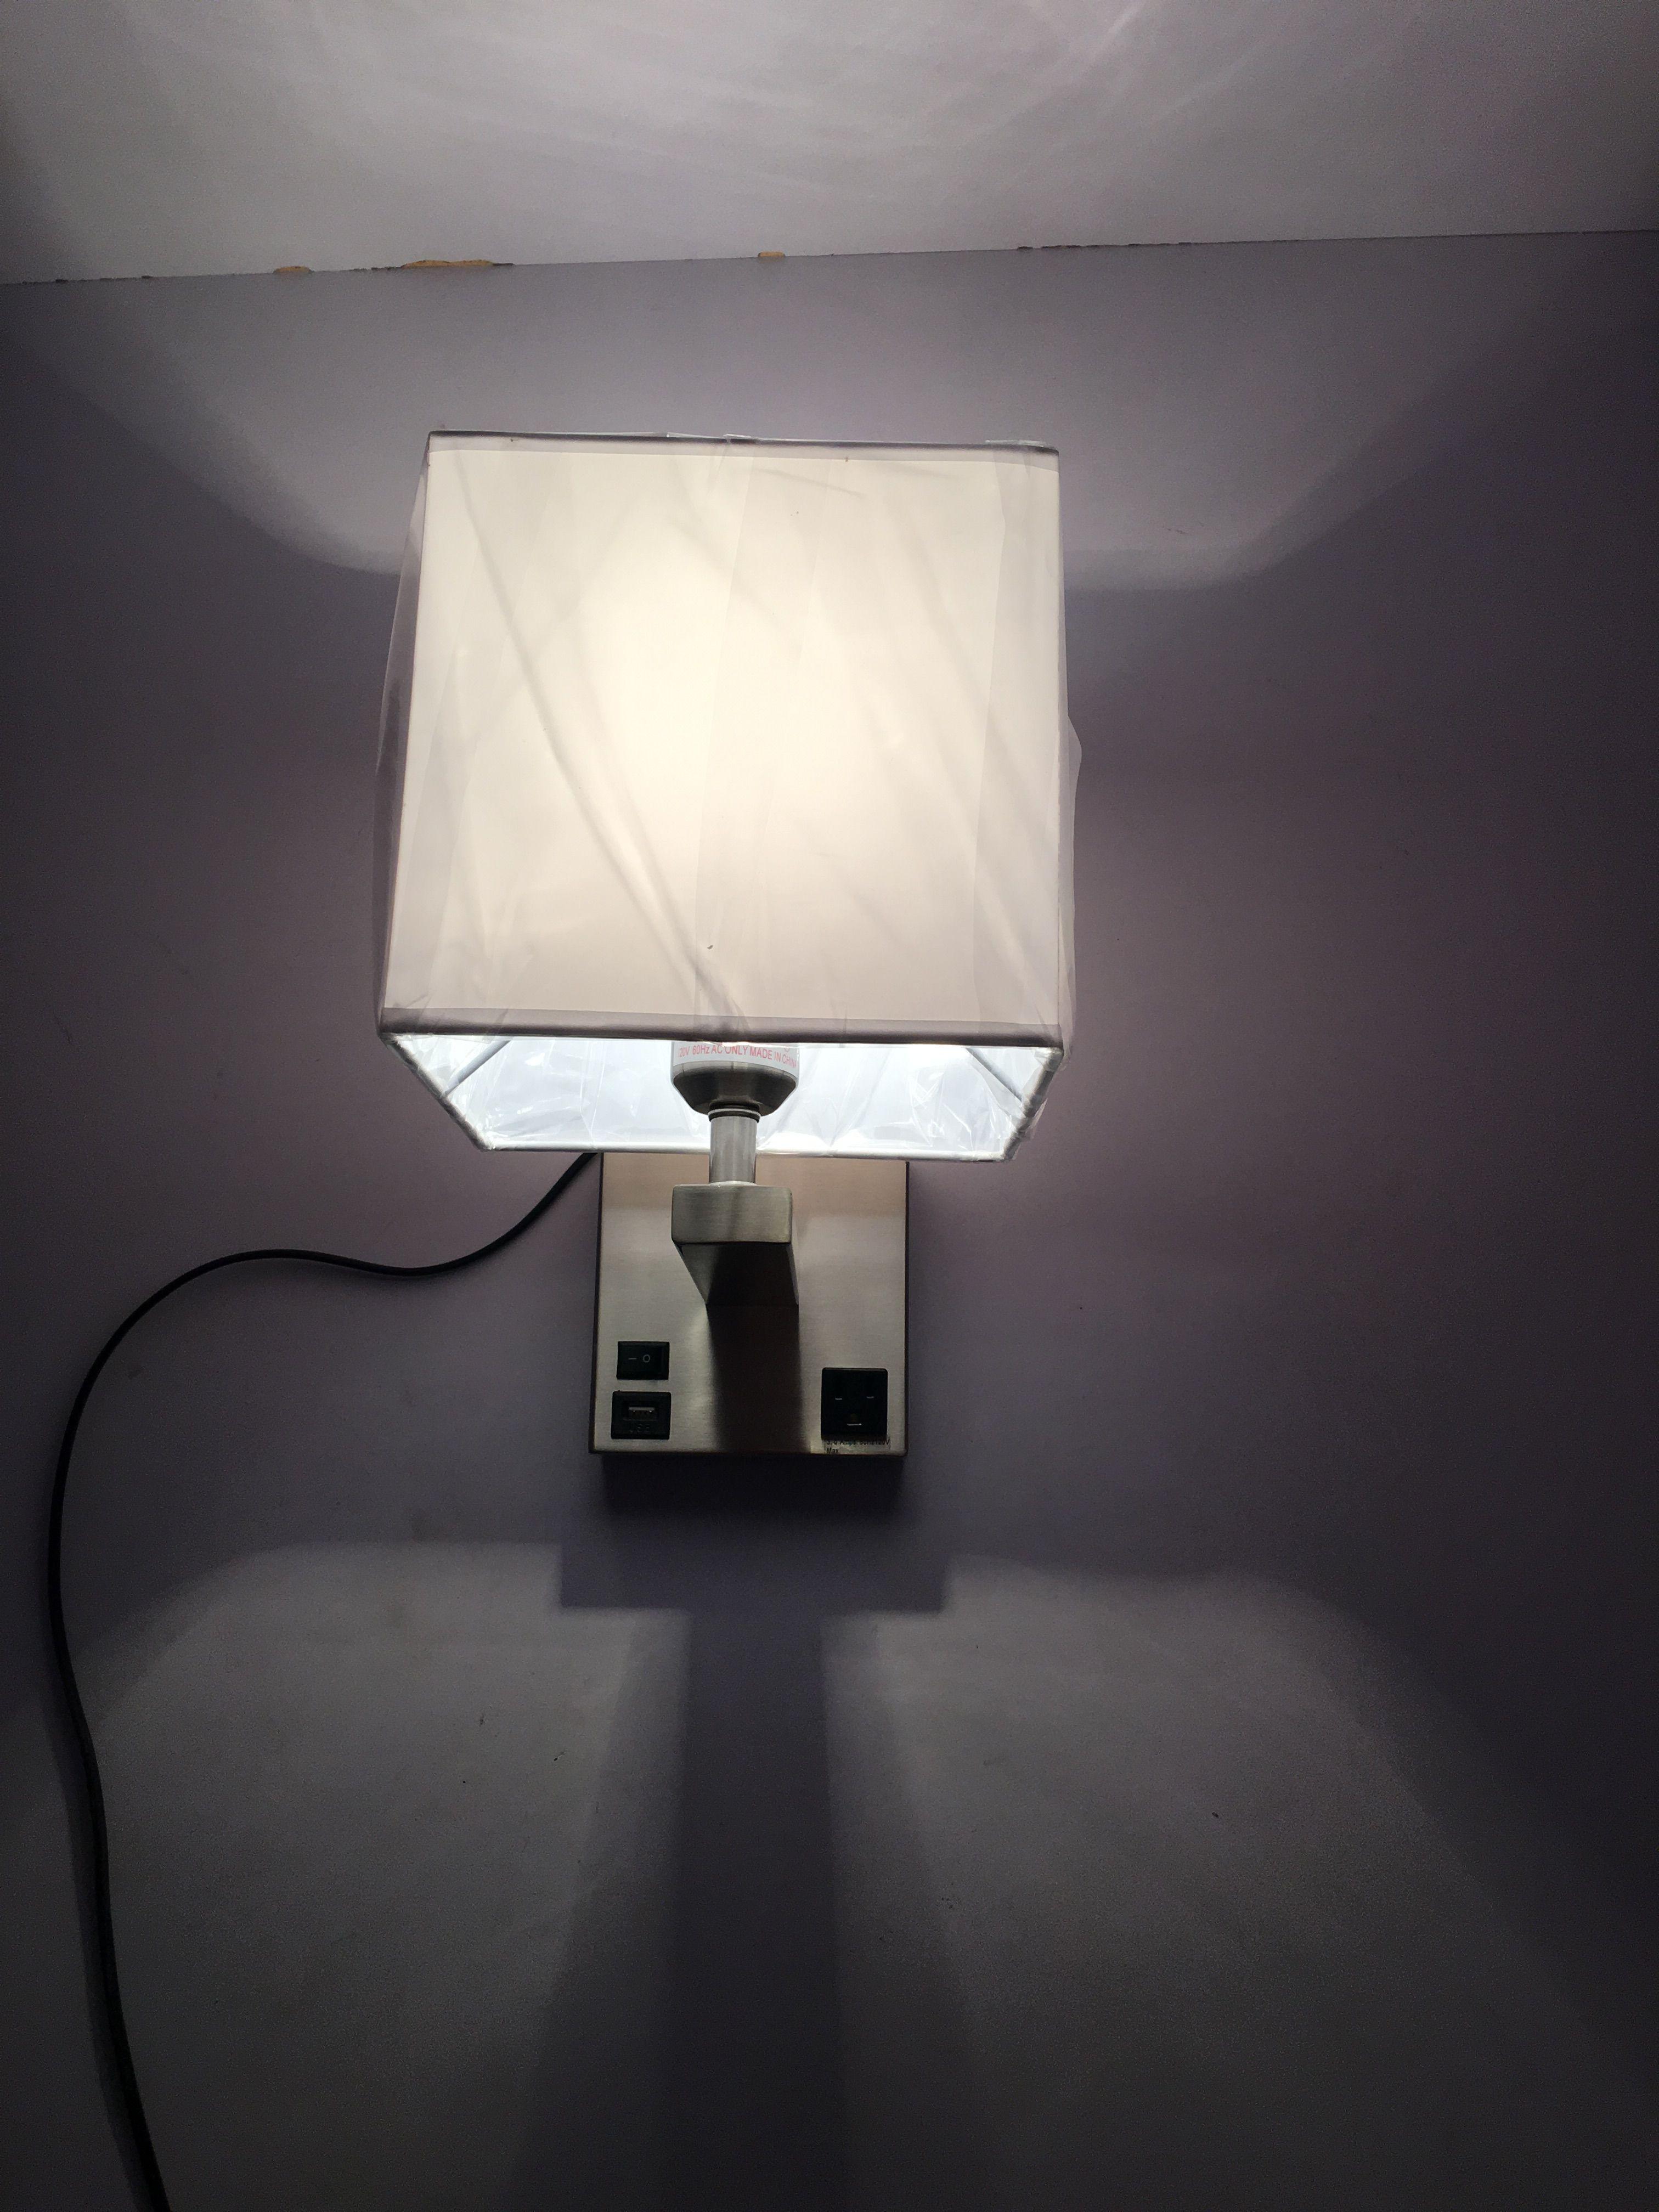 2018 Modern Hot Sale Single Wall Light For Sleep Inn & Suites With ...